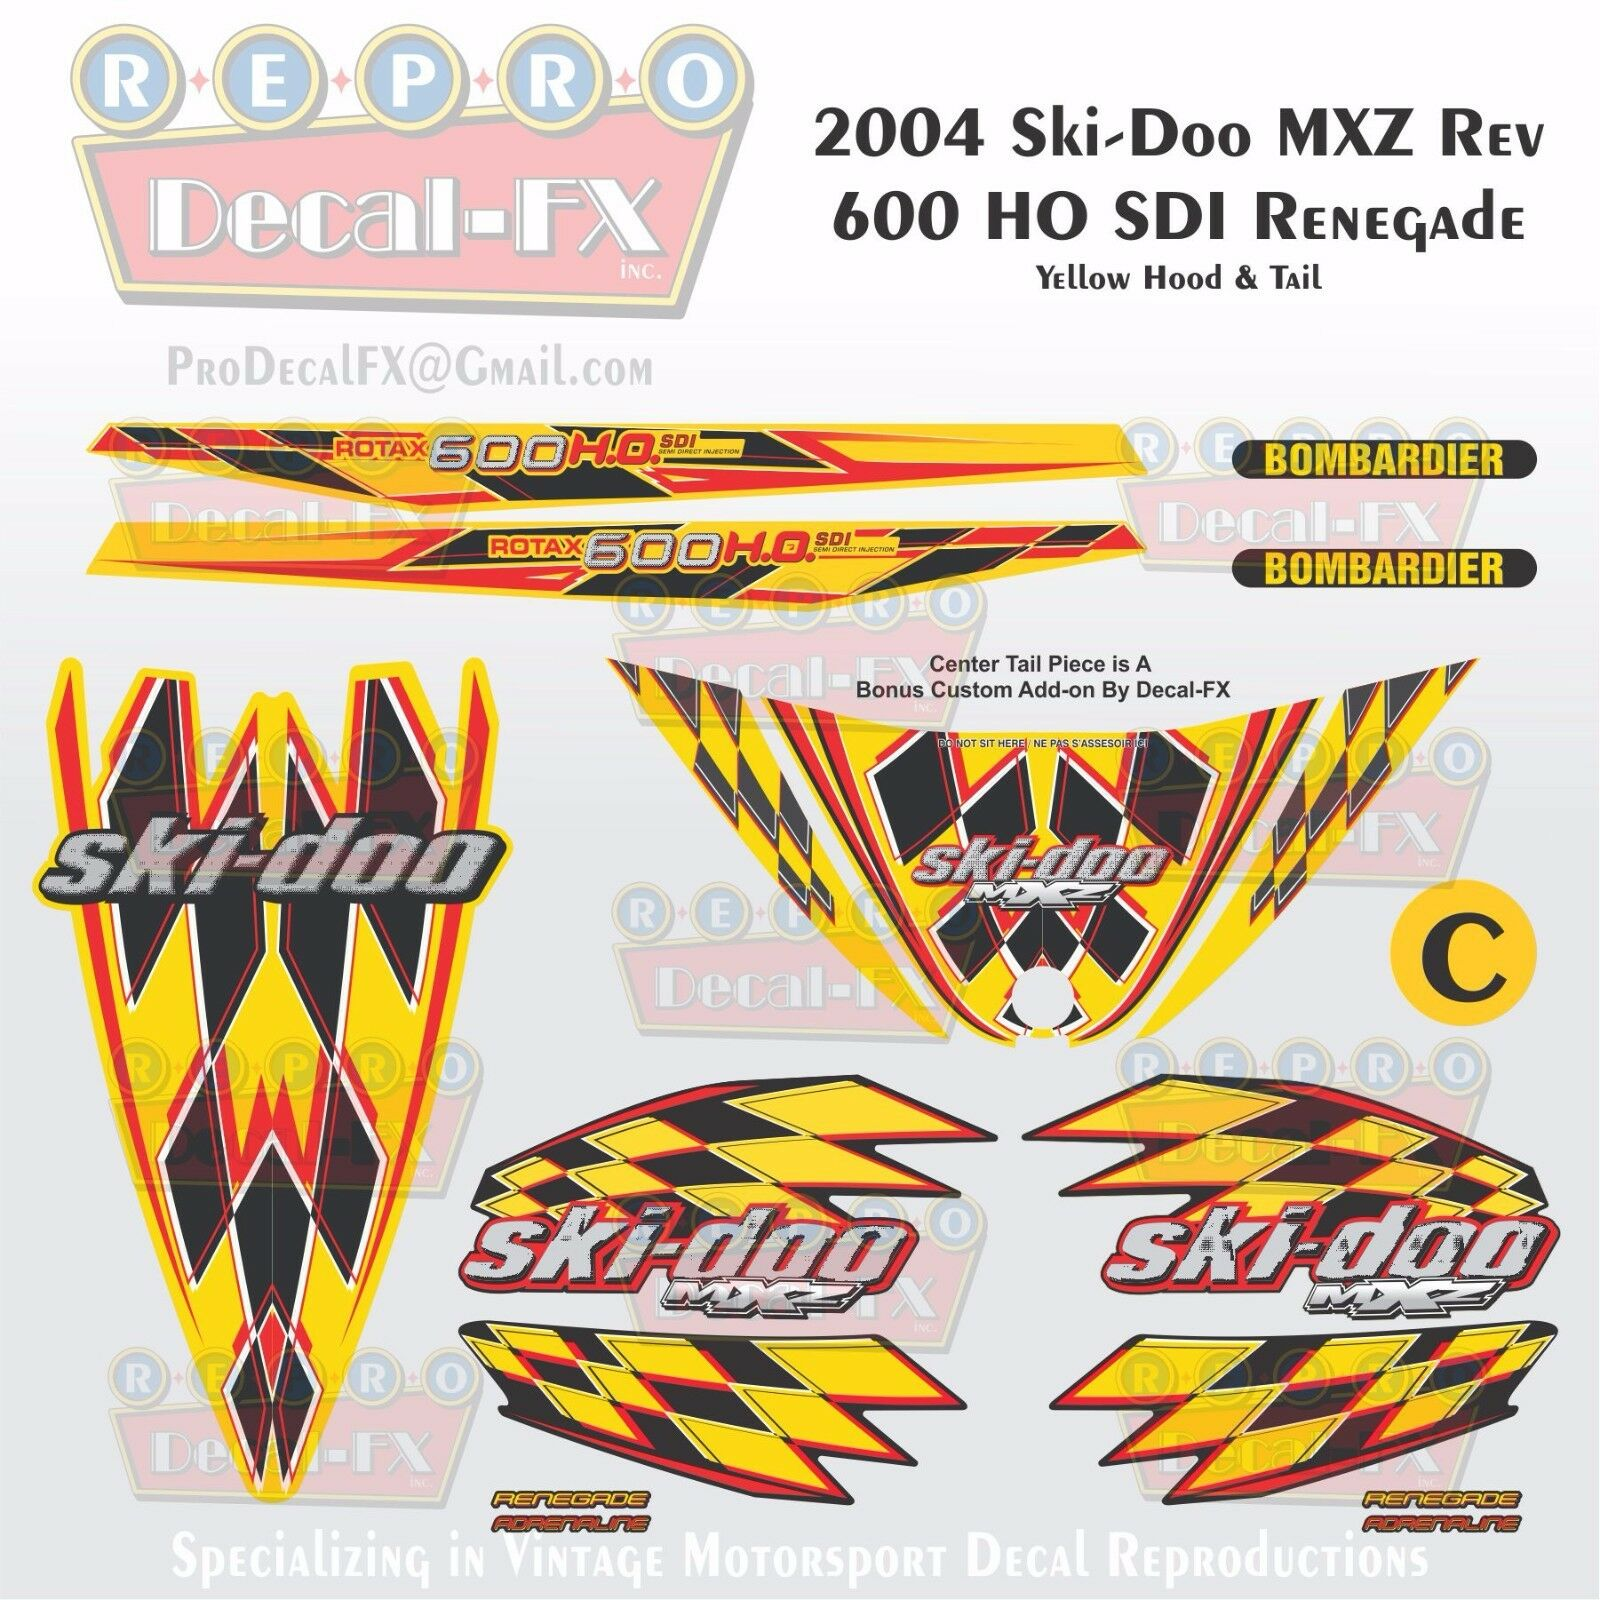 2004 Ski-doo MXZ600HO SDI Yellow Hood & Tail Rev Reproduction Vinyl Decals16Pc